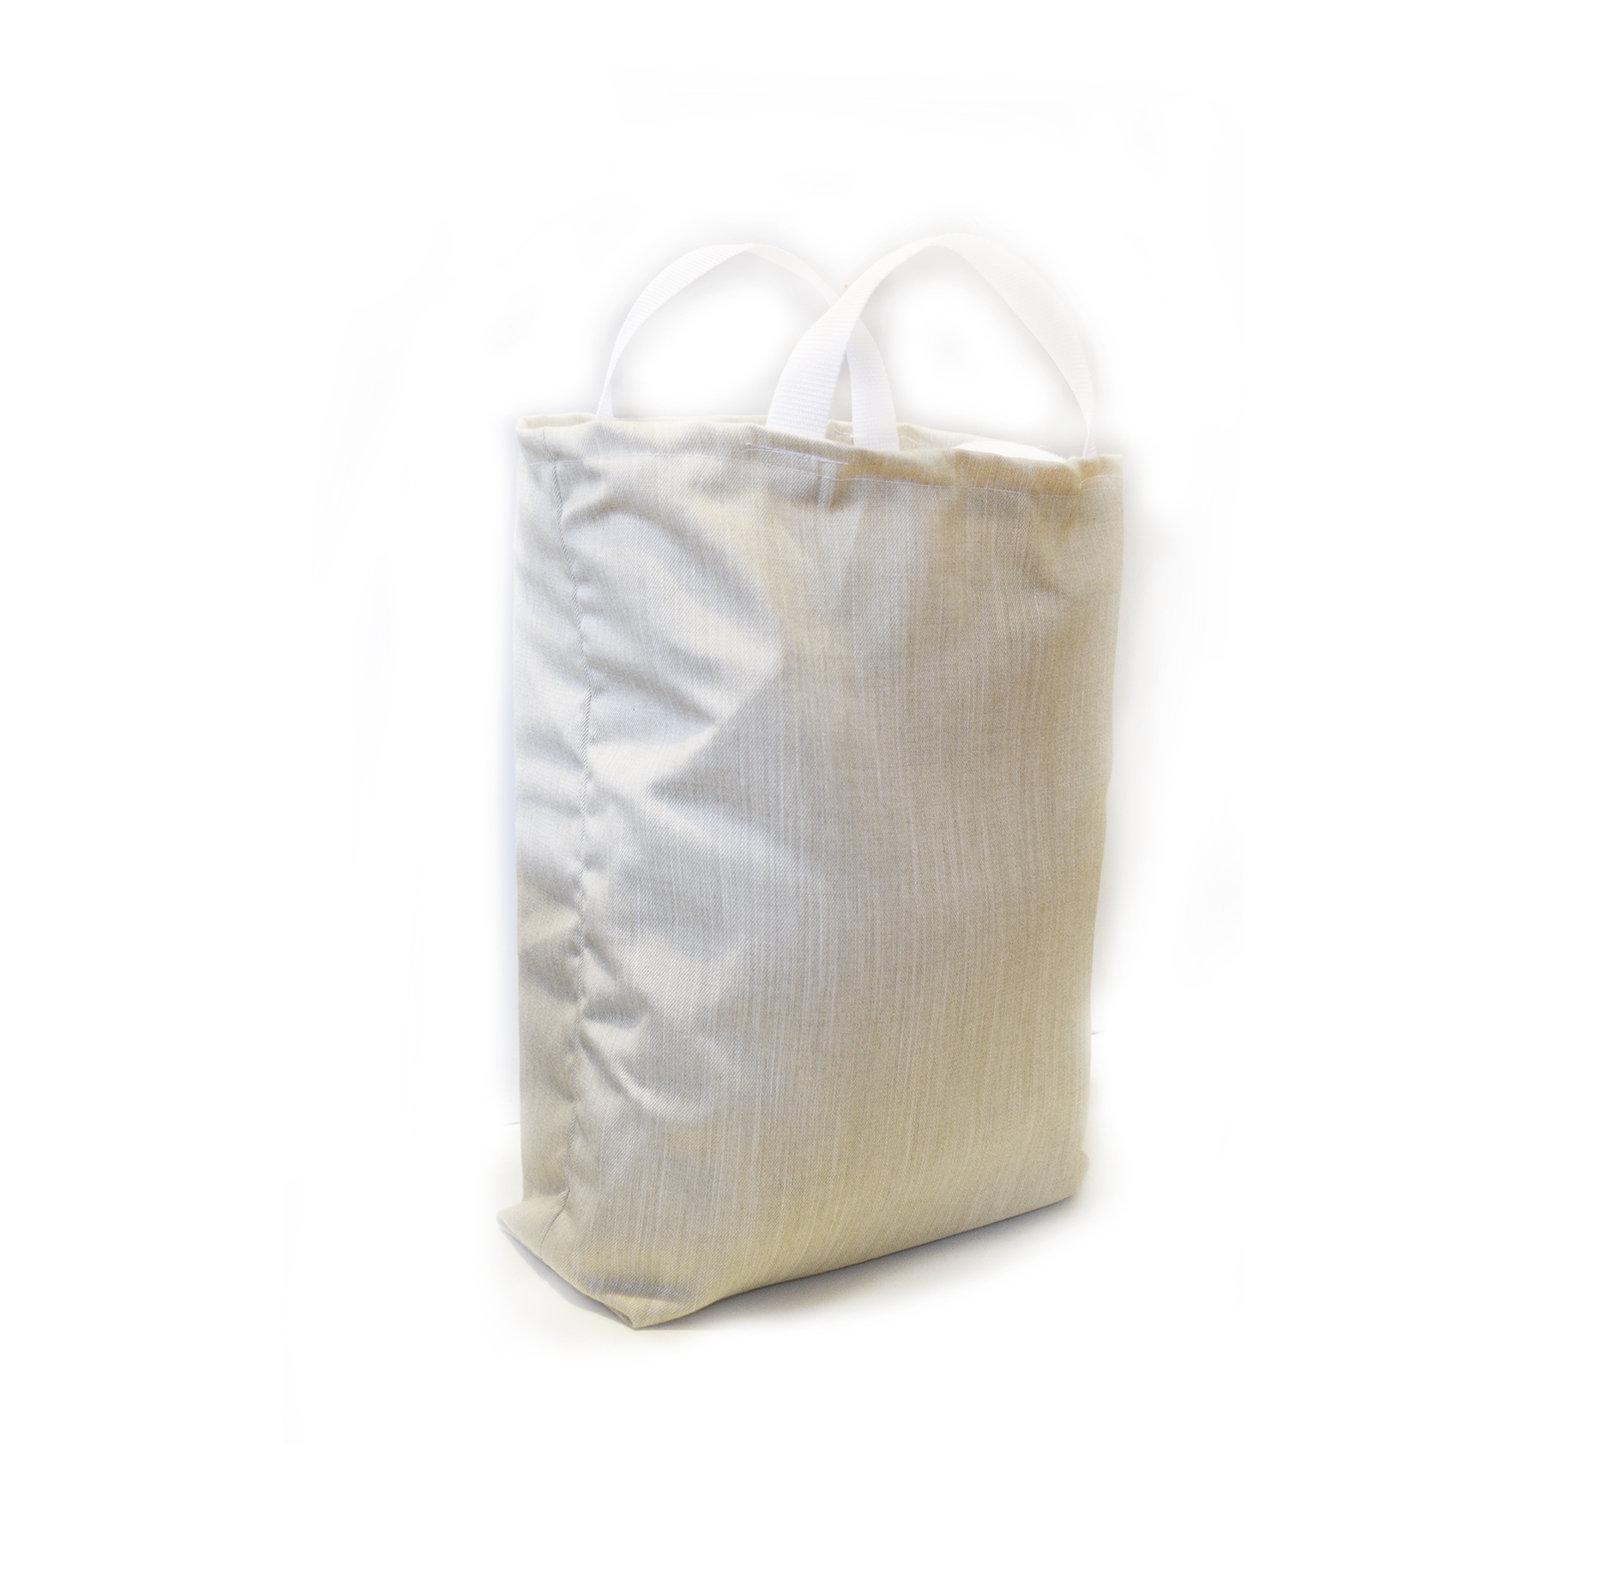 Simply Good™ Reusable Grocery Tote Bag 00401